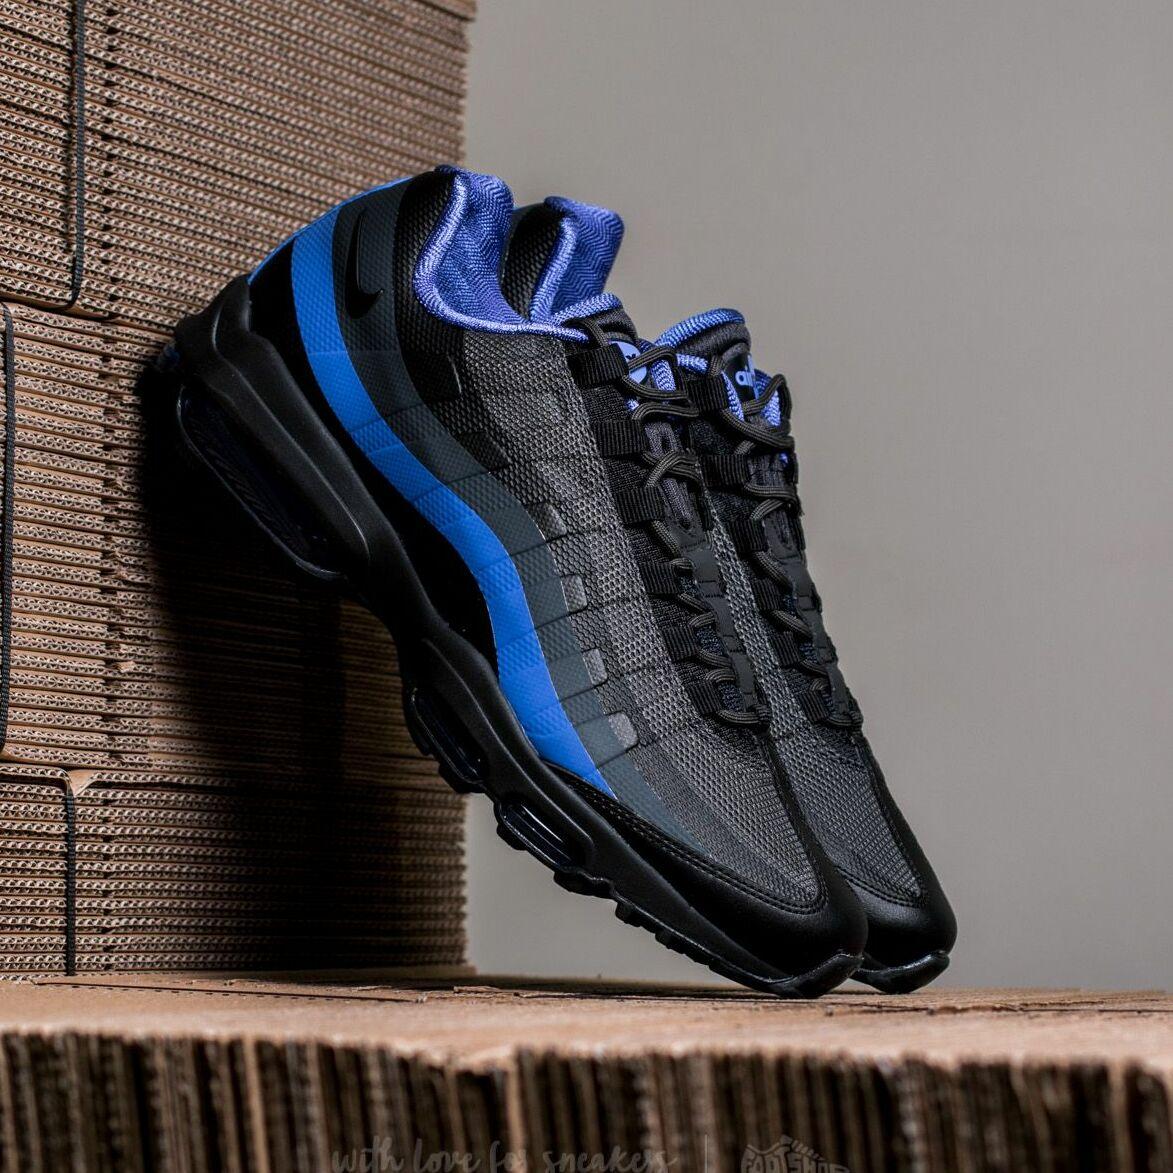 Nike Air Max 95 Ultra Essential Black/ Black-Paramount Blue 857910-004